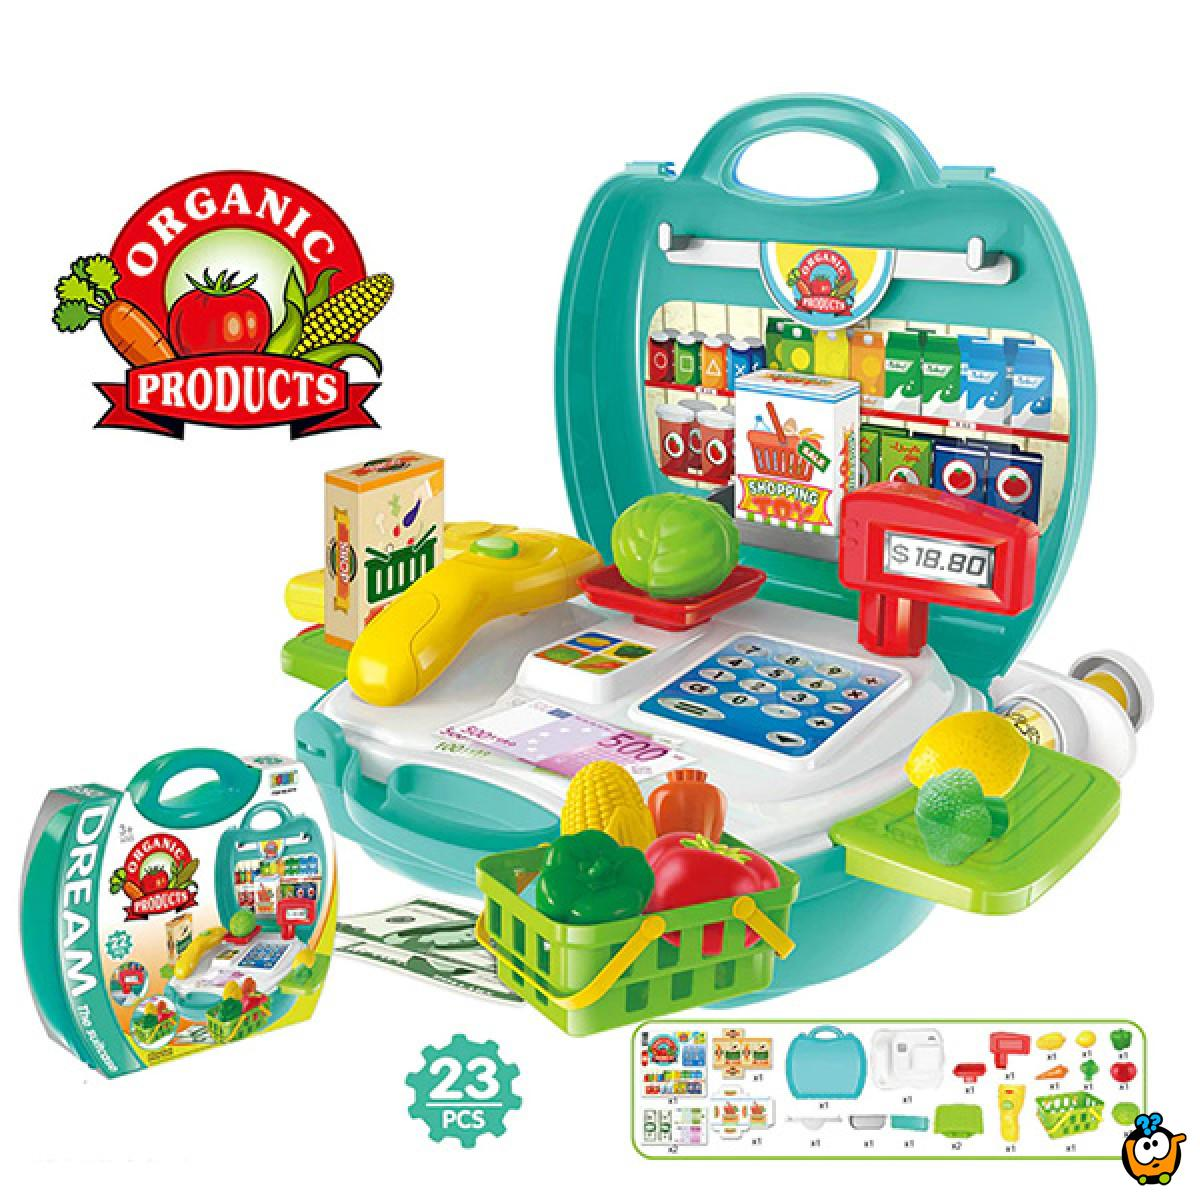 Dream kofer set - Organic Products - Organski proizvodi minimarket